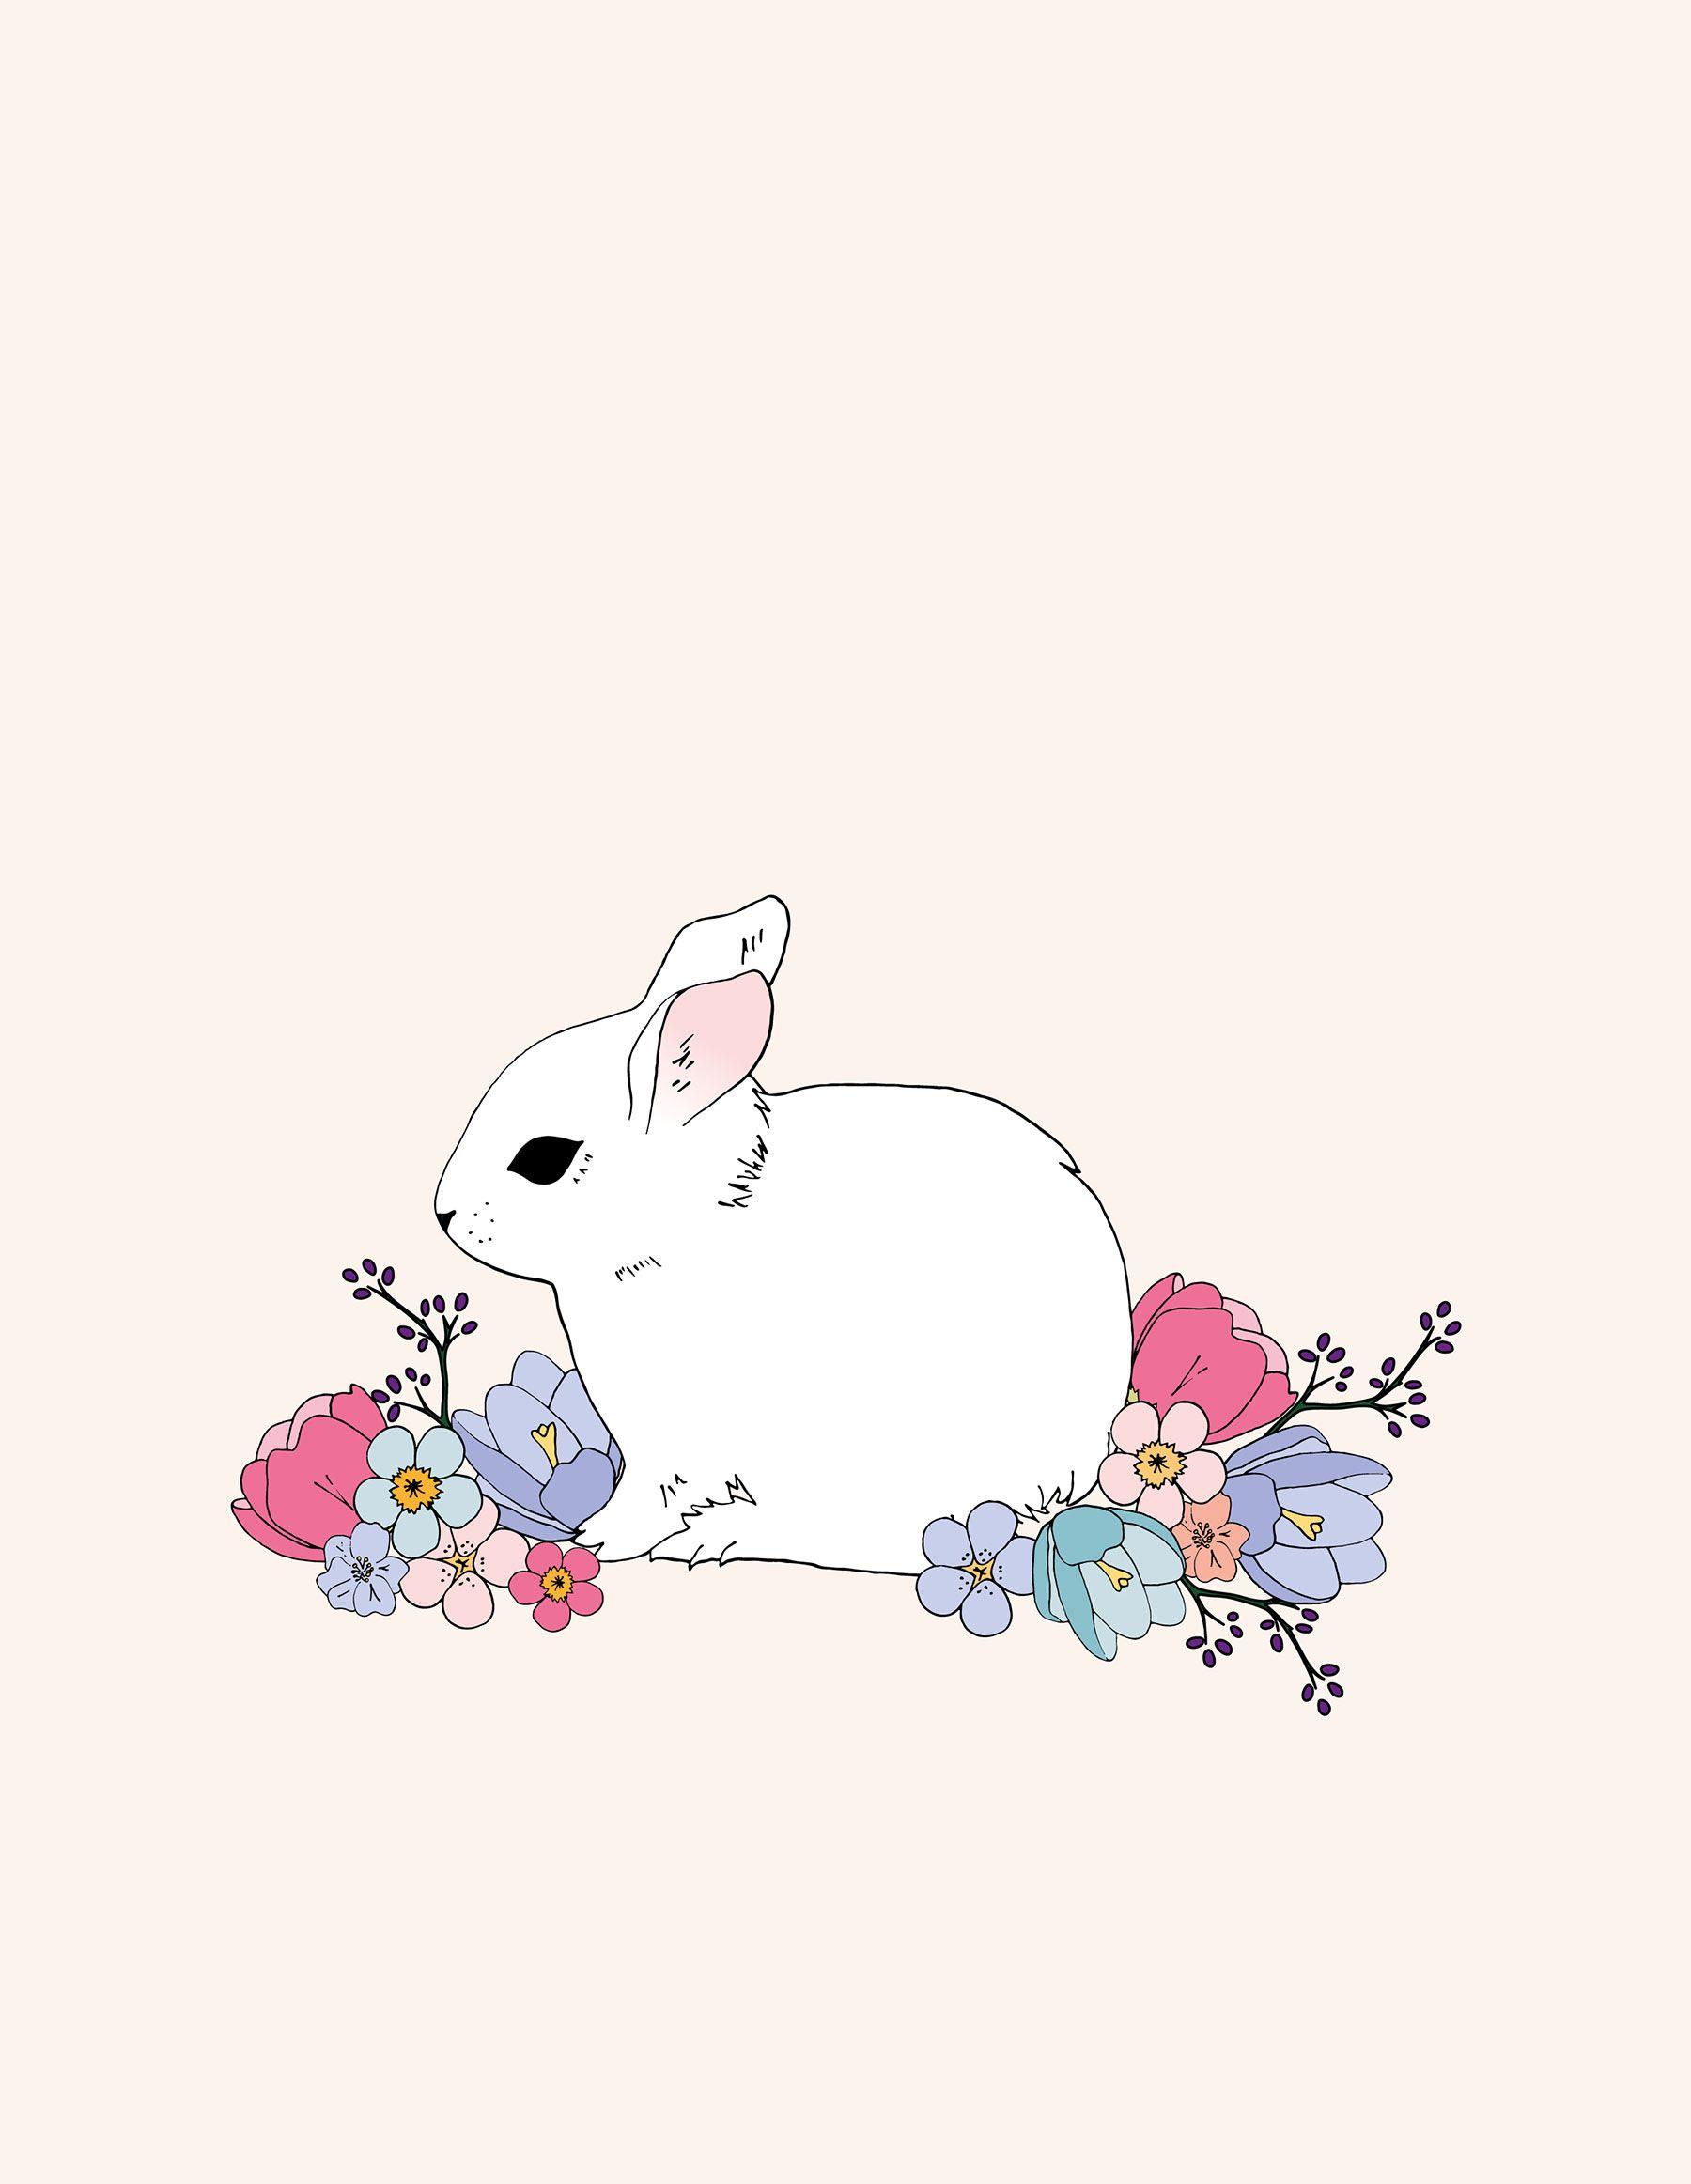 Spring Bunny Desktop Wallpaper Easter Wallpaper Cute Wallpapers